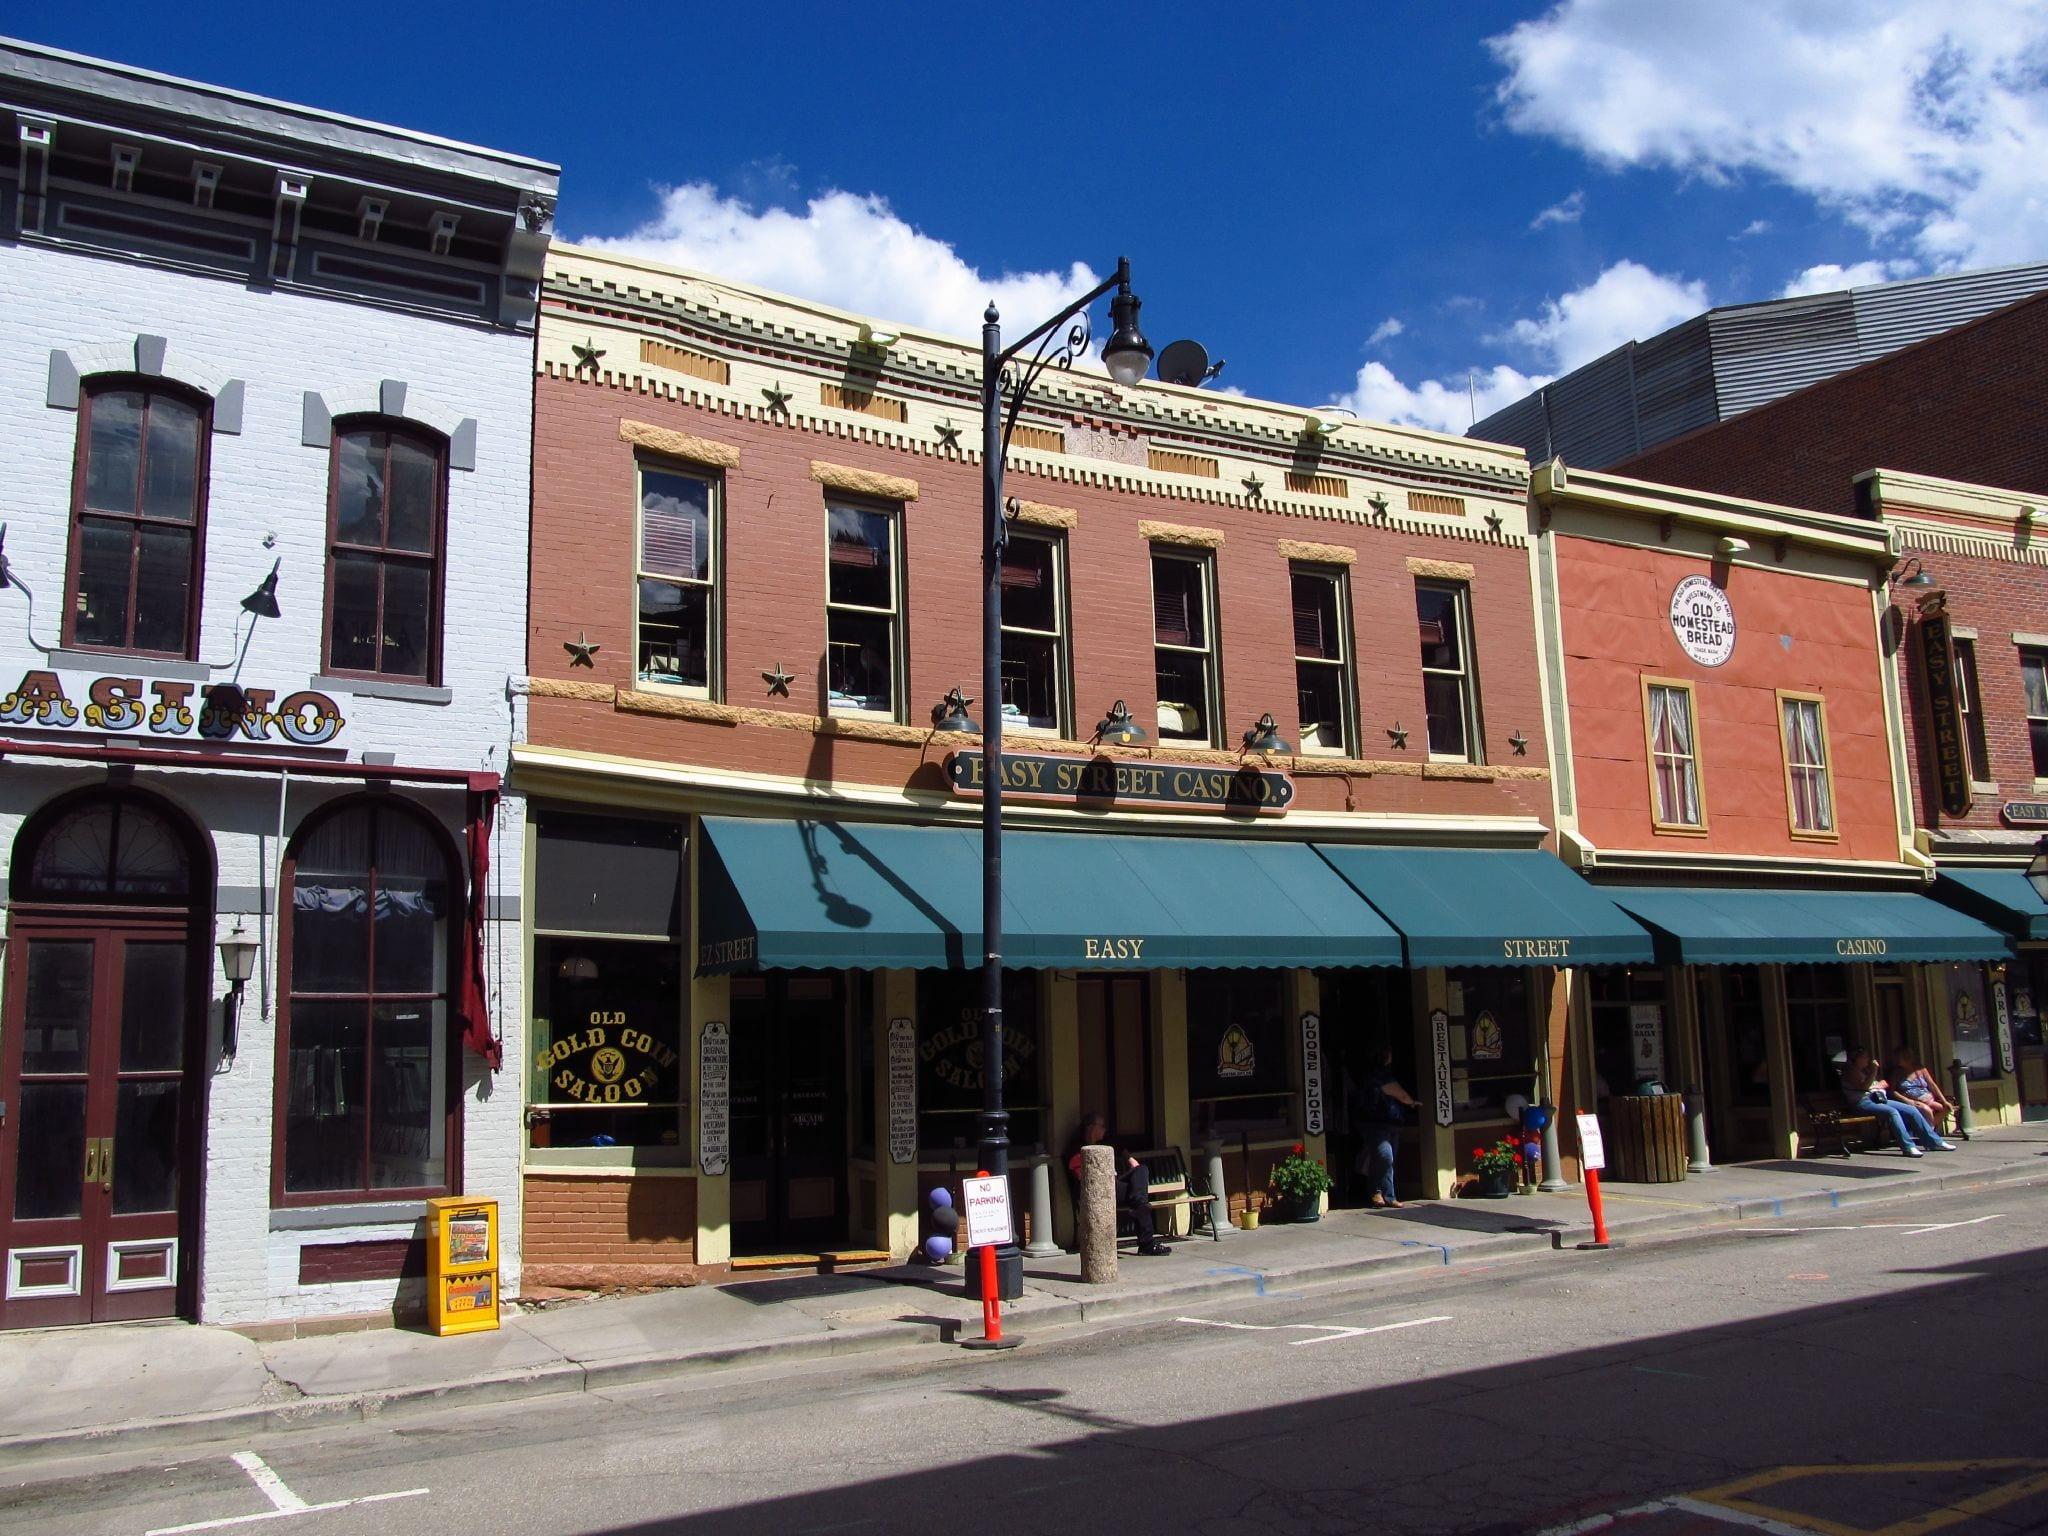 image of easy street casino